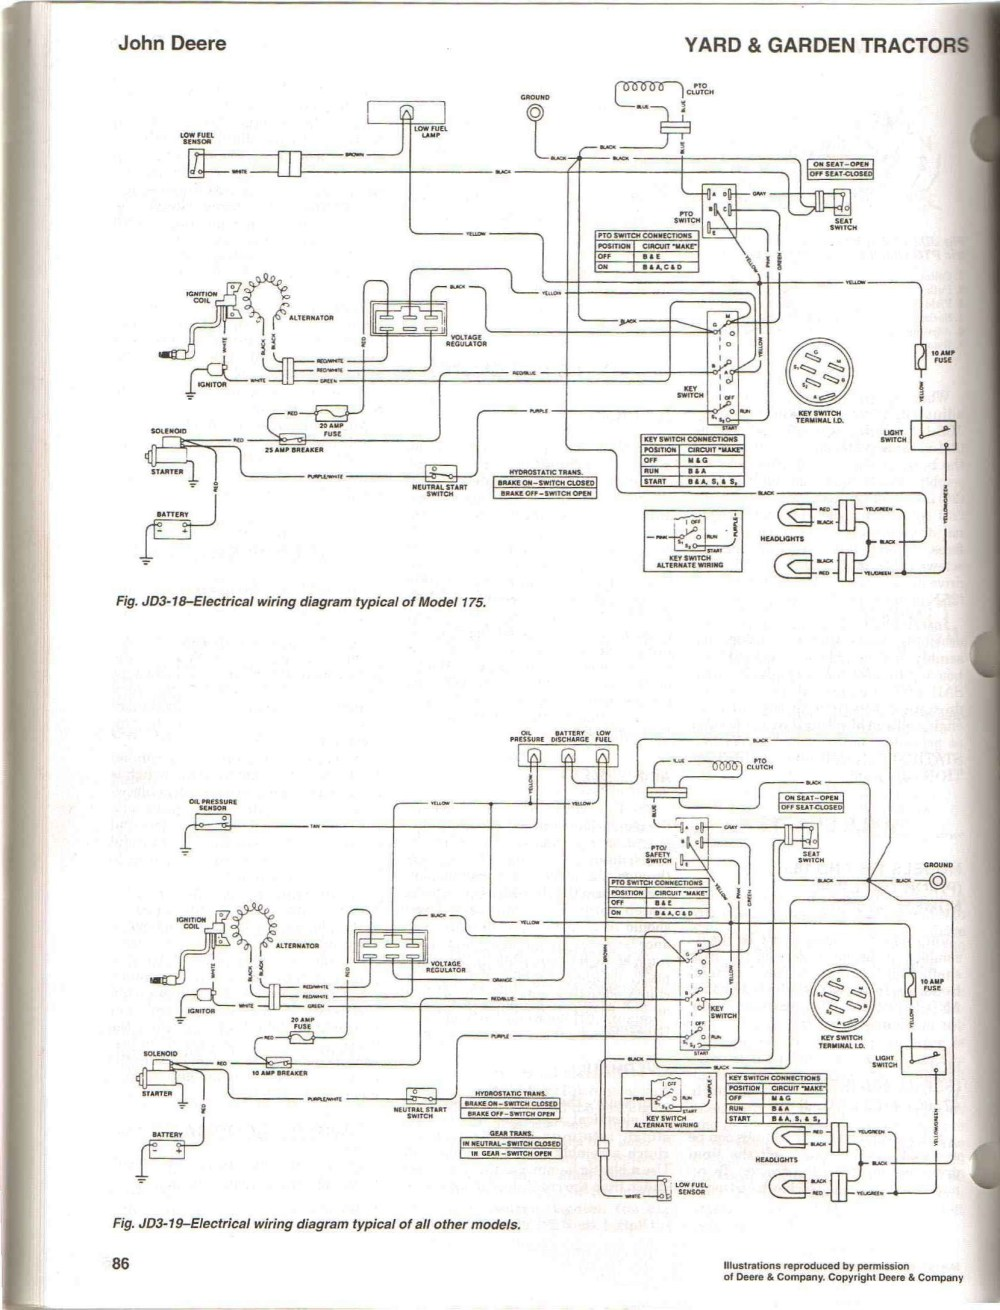 medium resolution of john deere 185 wiring diagram diagram data schema john deere 185 hydro wiring diagram john deere 185 wiring diagram